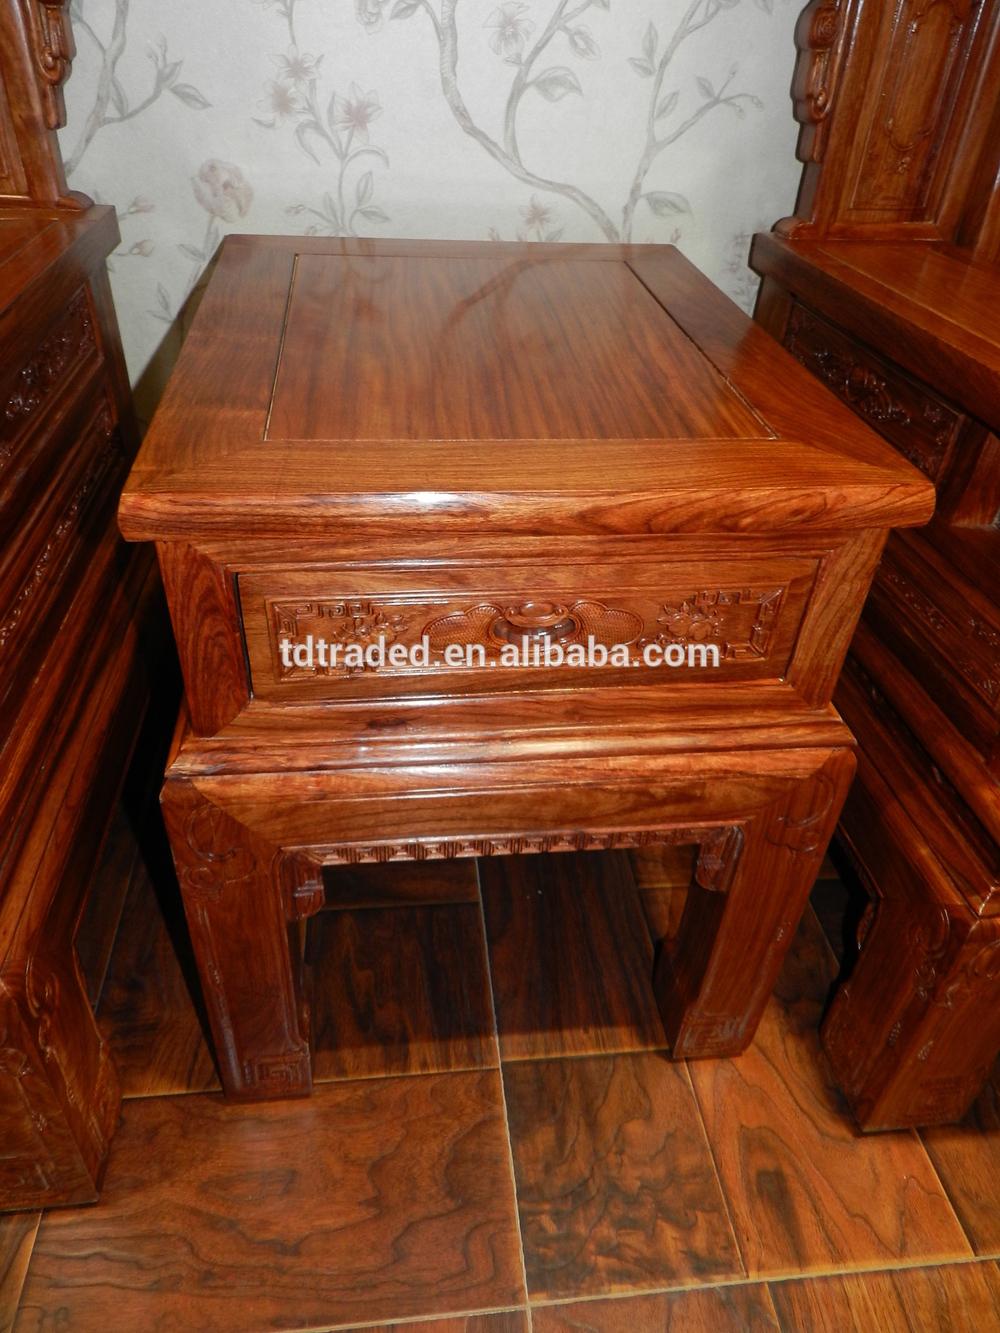 Hoge kwaliteit rode houten meubelen slaapkamer sets product id ...